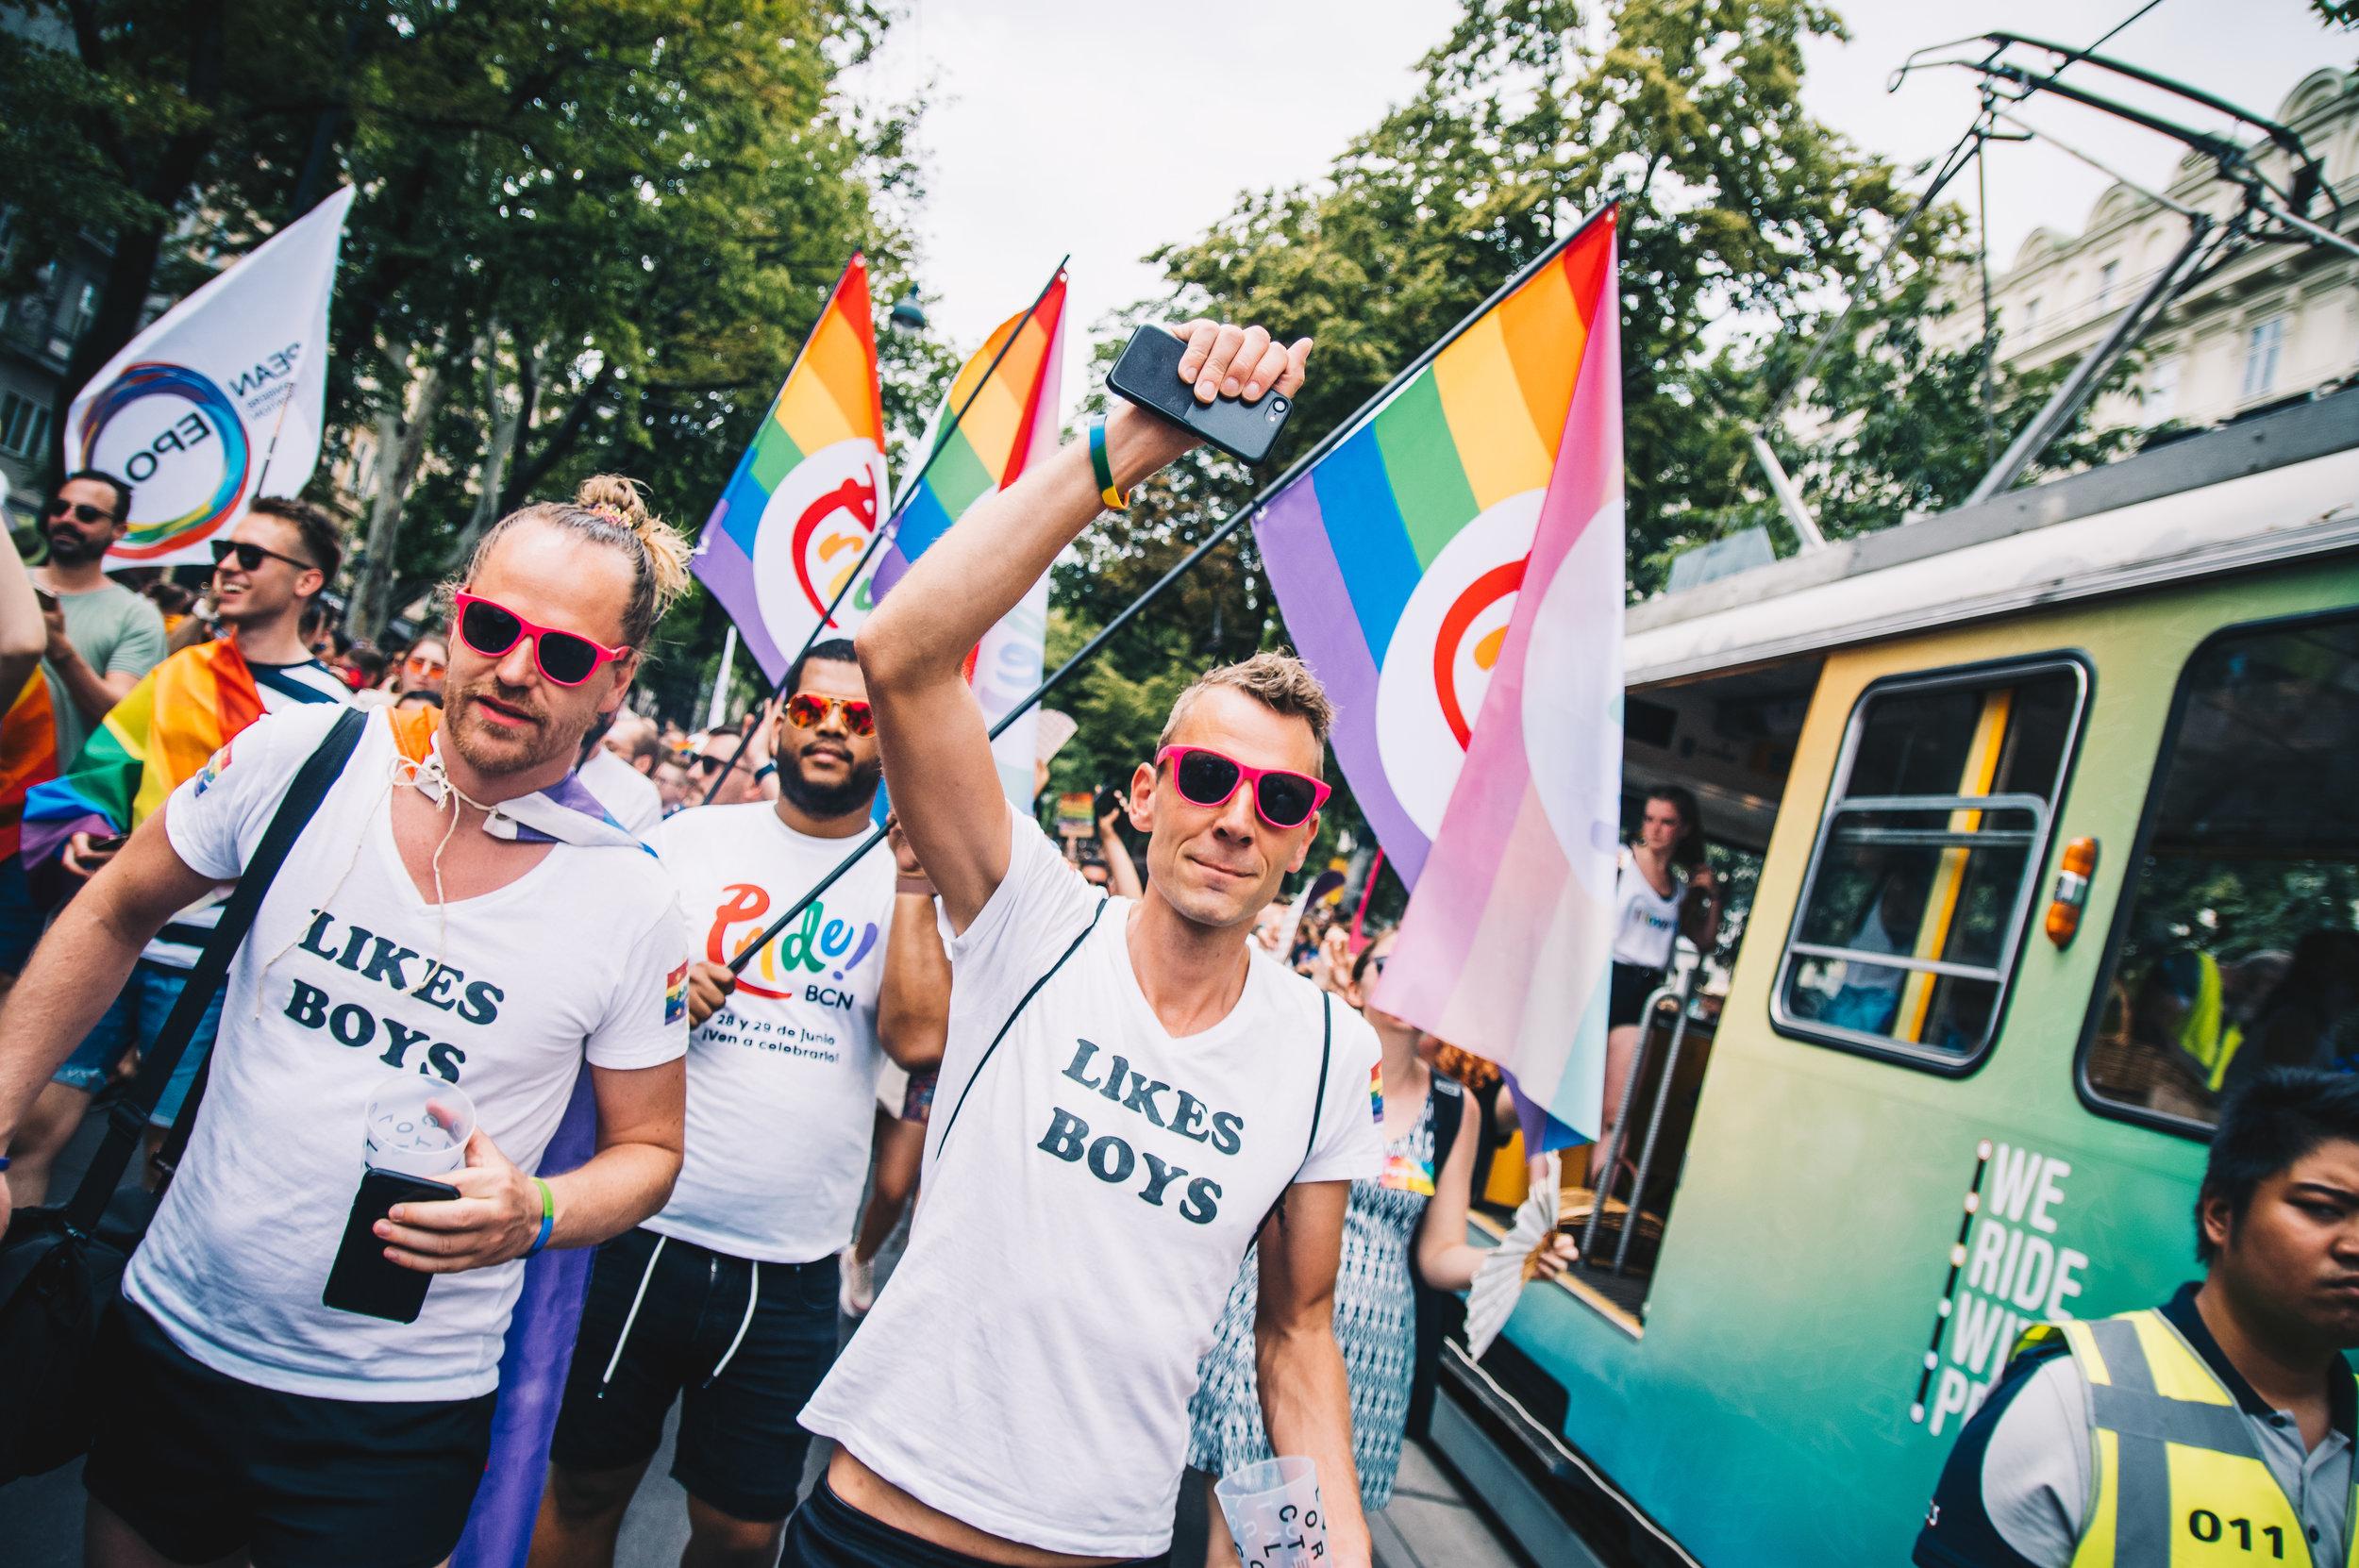 Euro Pride Vienna-4933.jpg